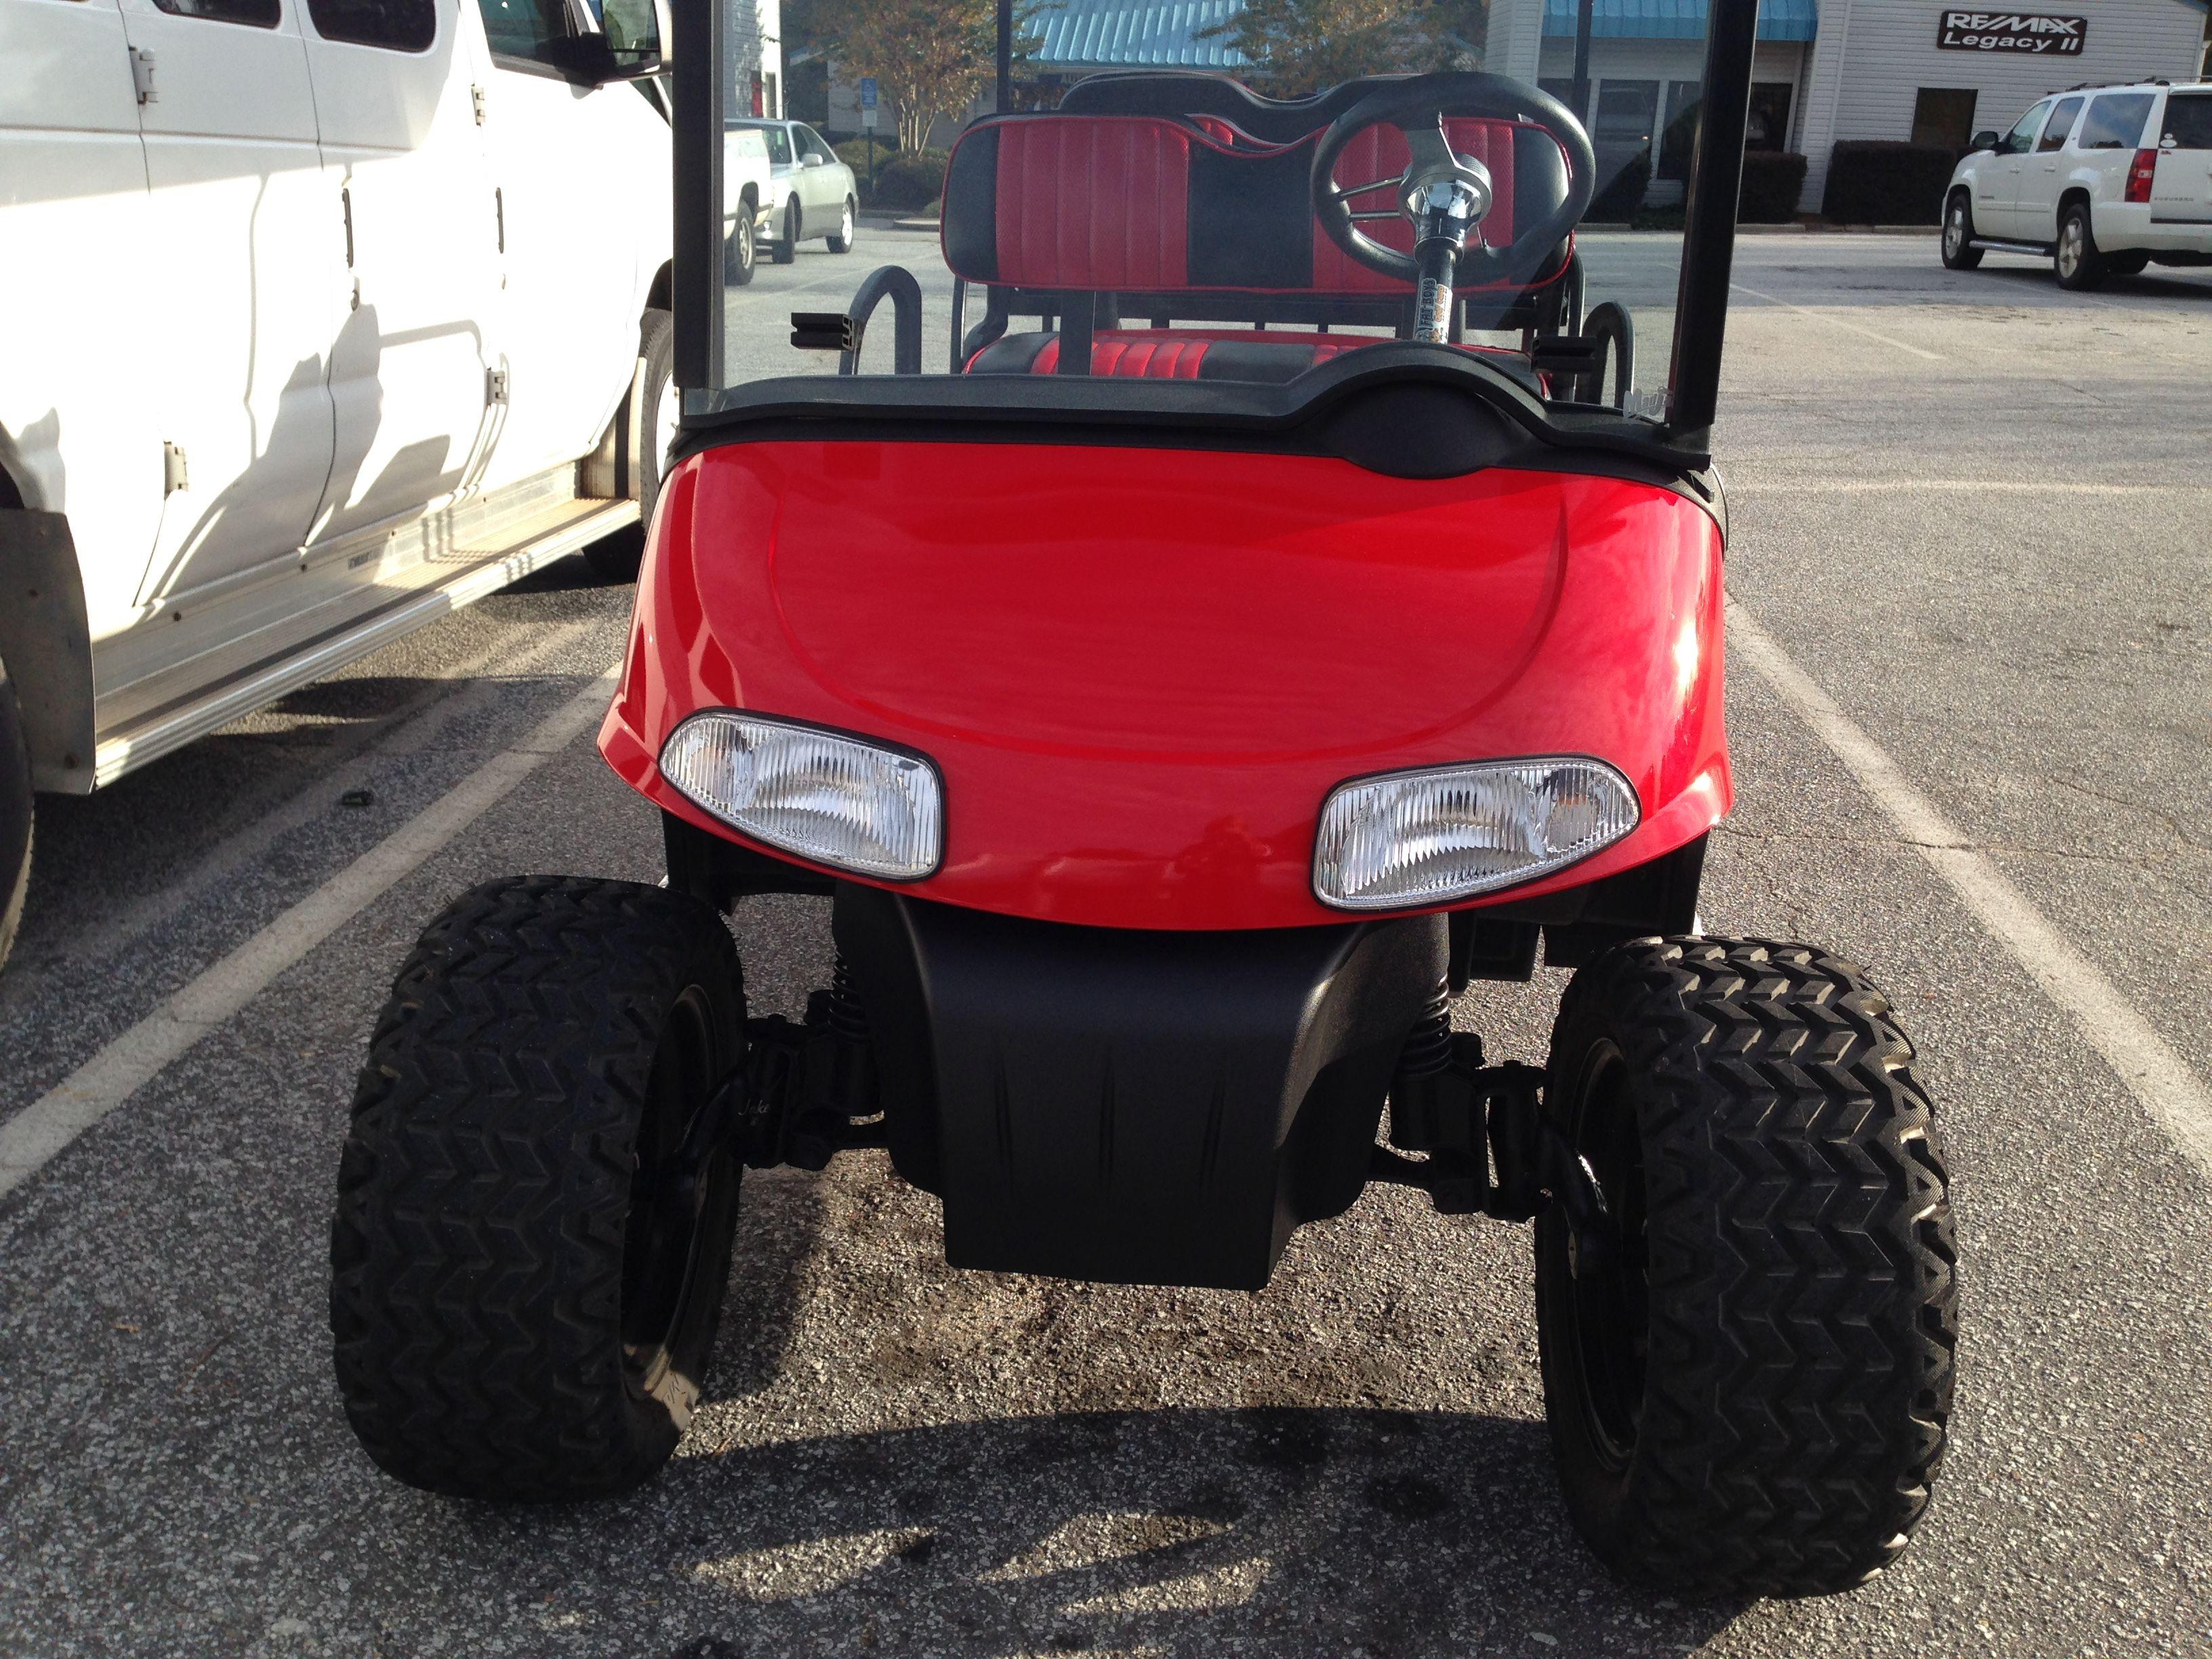 EZ GO Golf Cart - Makes, Models and EZGO Golf Cart Accessories ... Ez Go Golf Cart Belts on ez go golf cart engine parts, ez go golf cart exhaust, ez go golf cart coolers, ez go golf cart front end, ez go golf cart seats, ez go golf cart kits, ez go golf cart drive train,